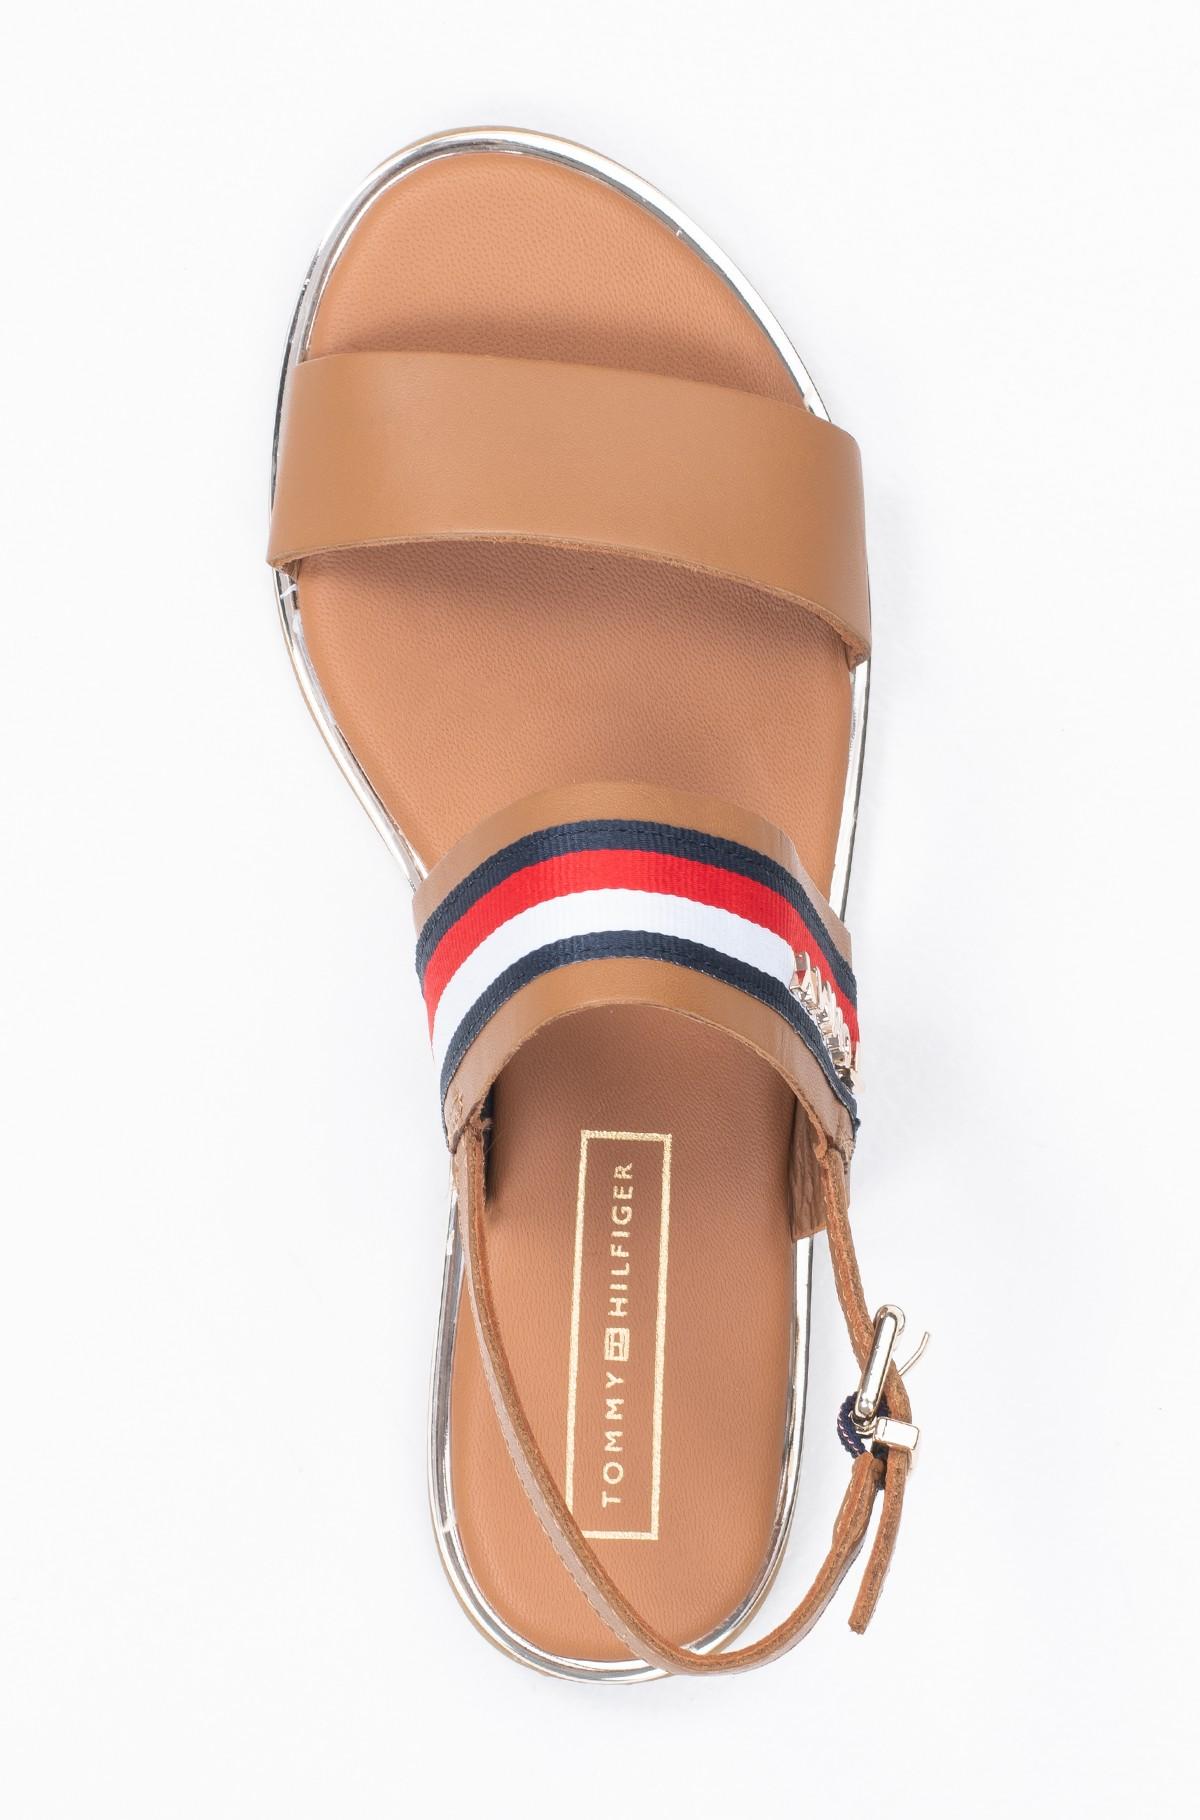 Sandals FLAT SANDAL CORPORATE RIBBON-full-3